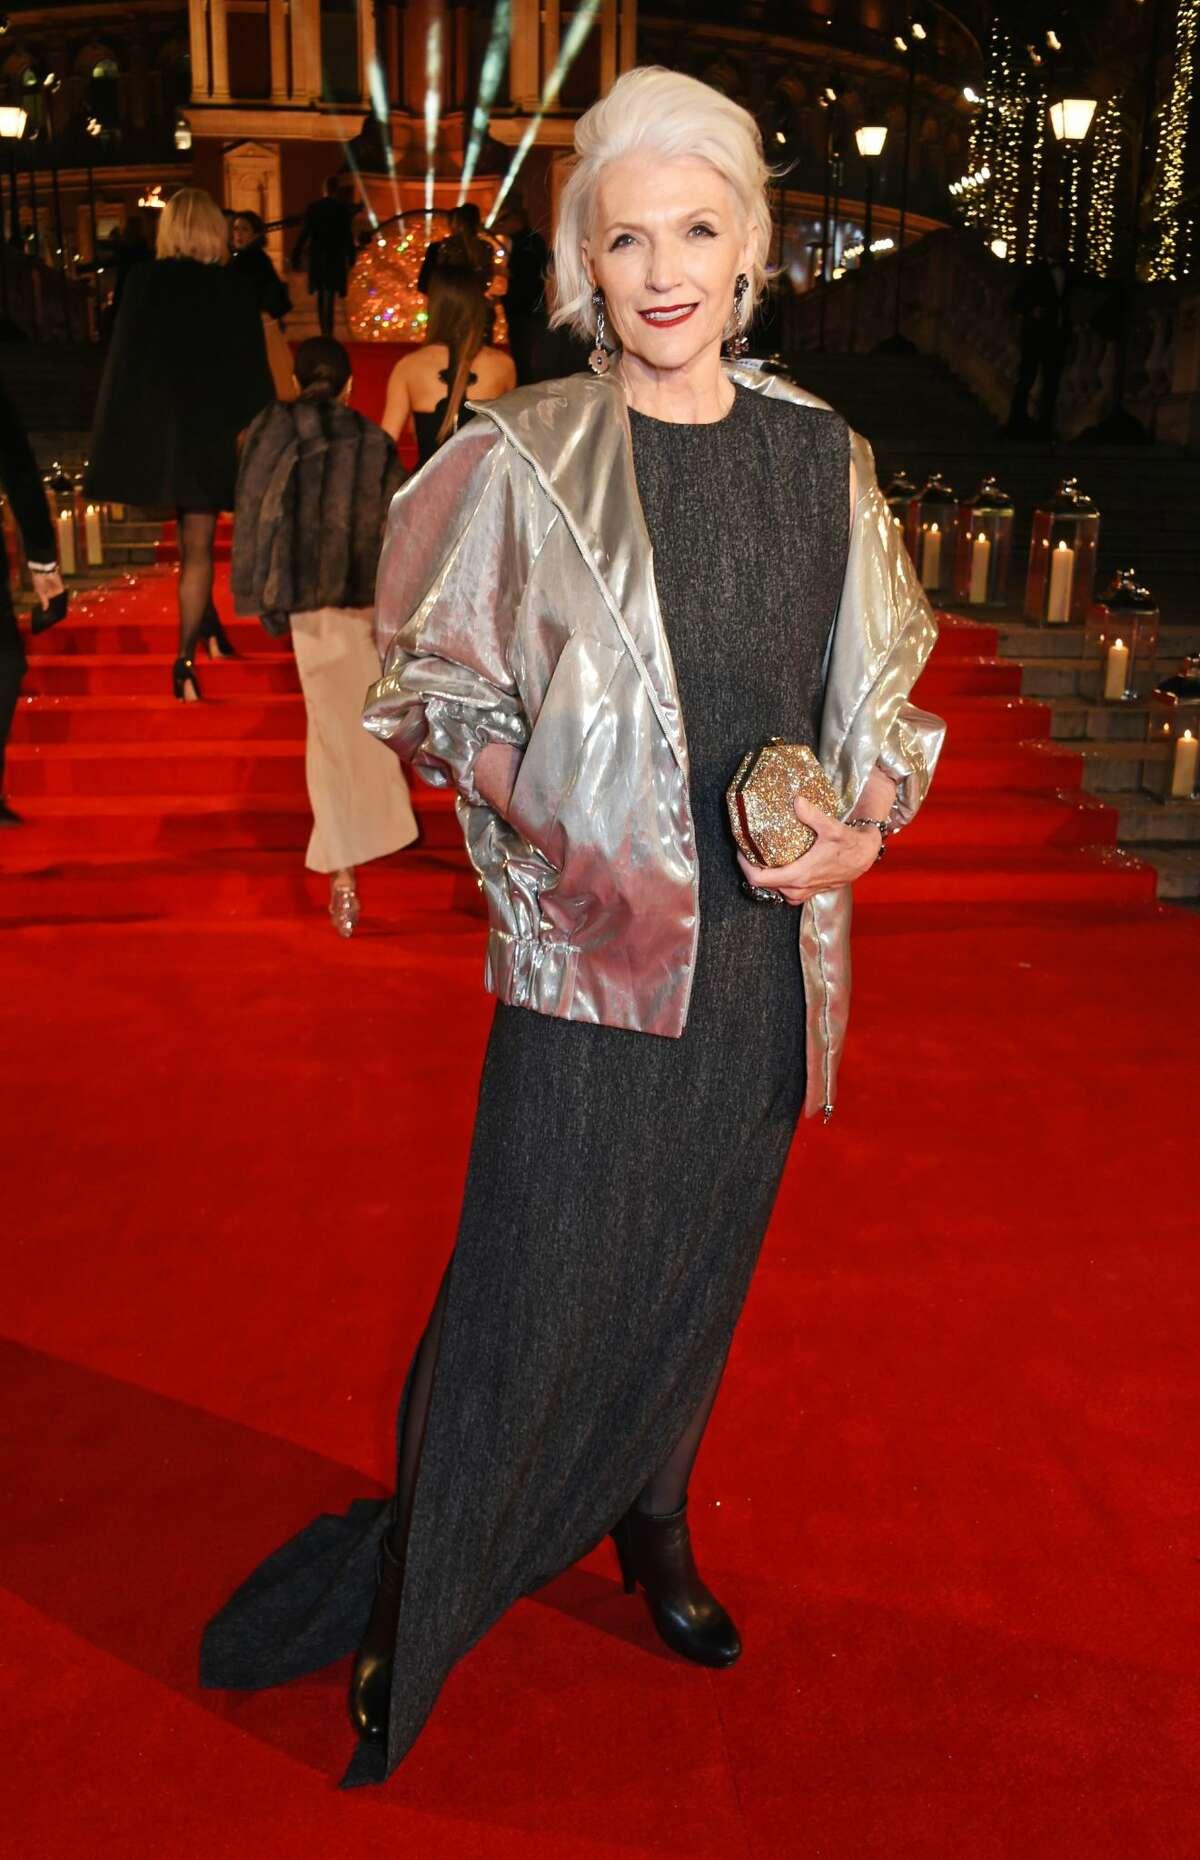 December 2016: The Fashion Awards 2016 at Royal Albert Hall in London.